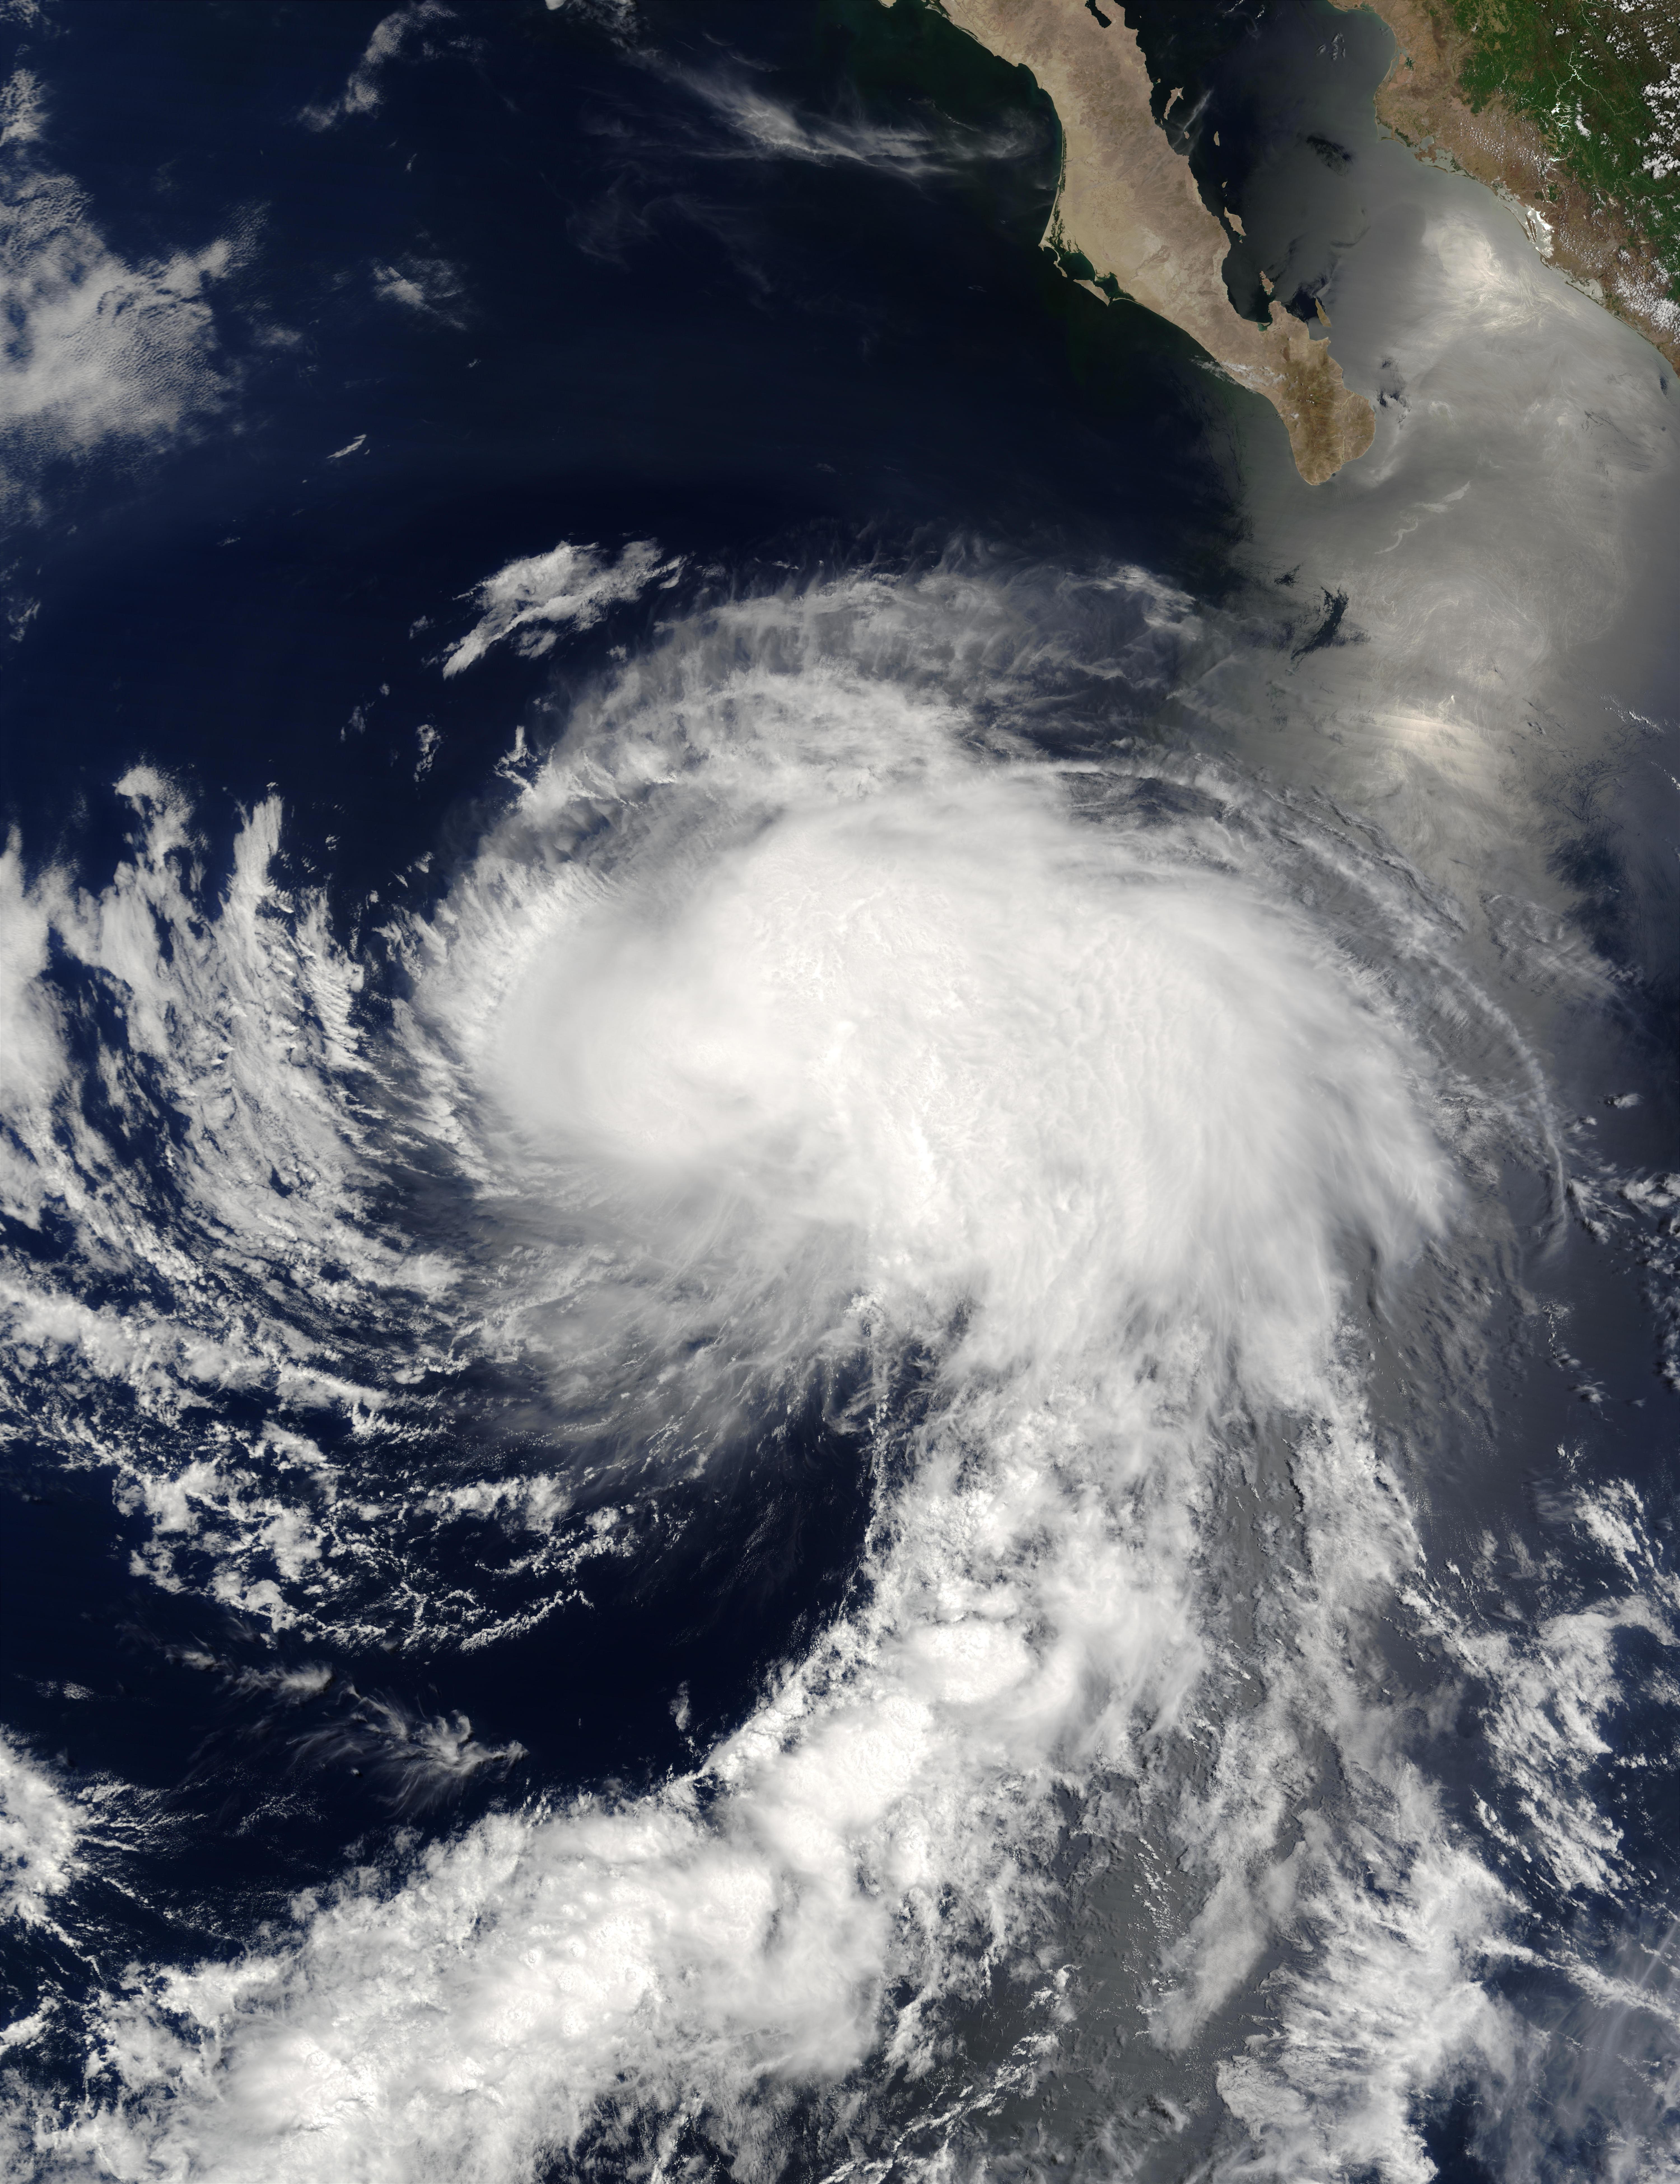 File:Tropical storm enrique (2003).jpg - Wikimedia Commons